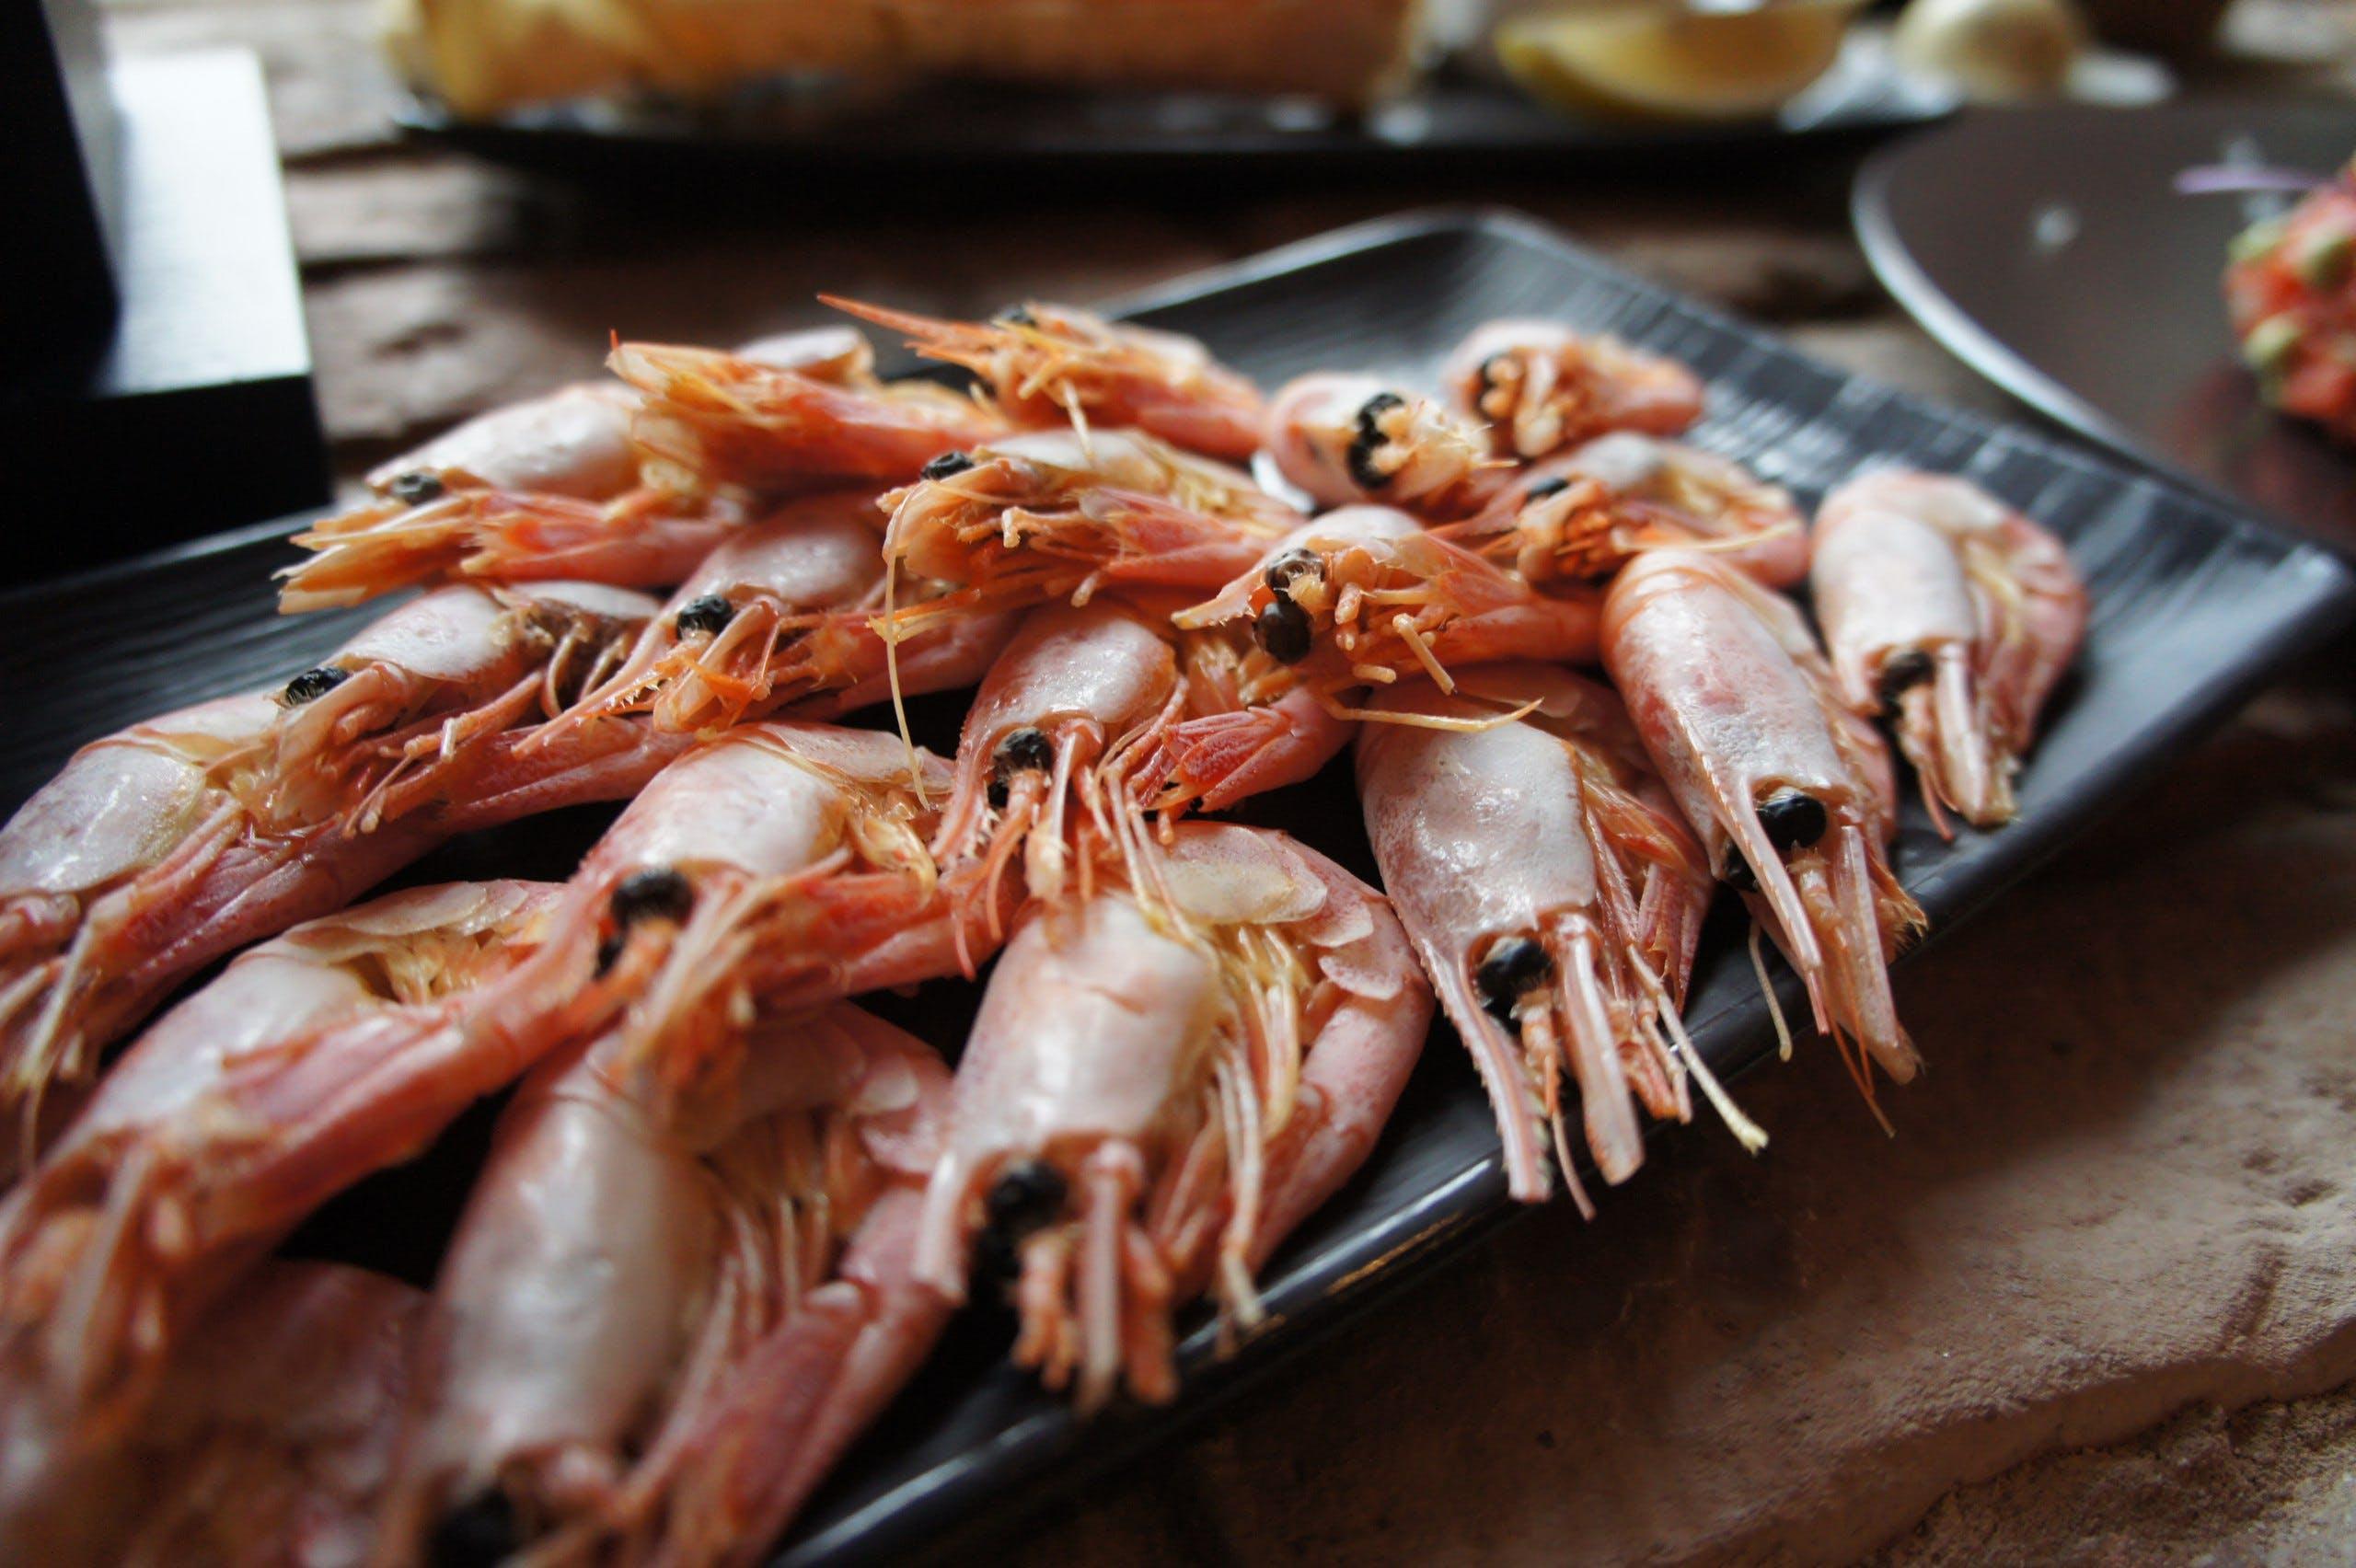 Free stock photo of food, foodphoto, prawn, Prawns